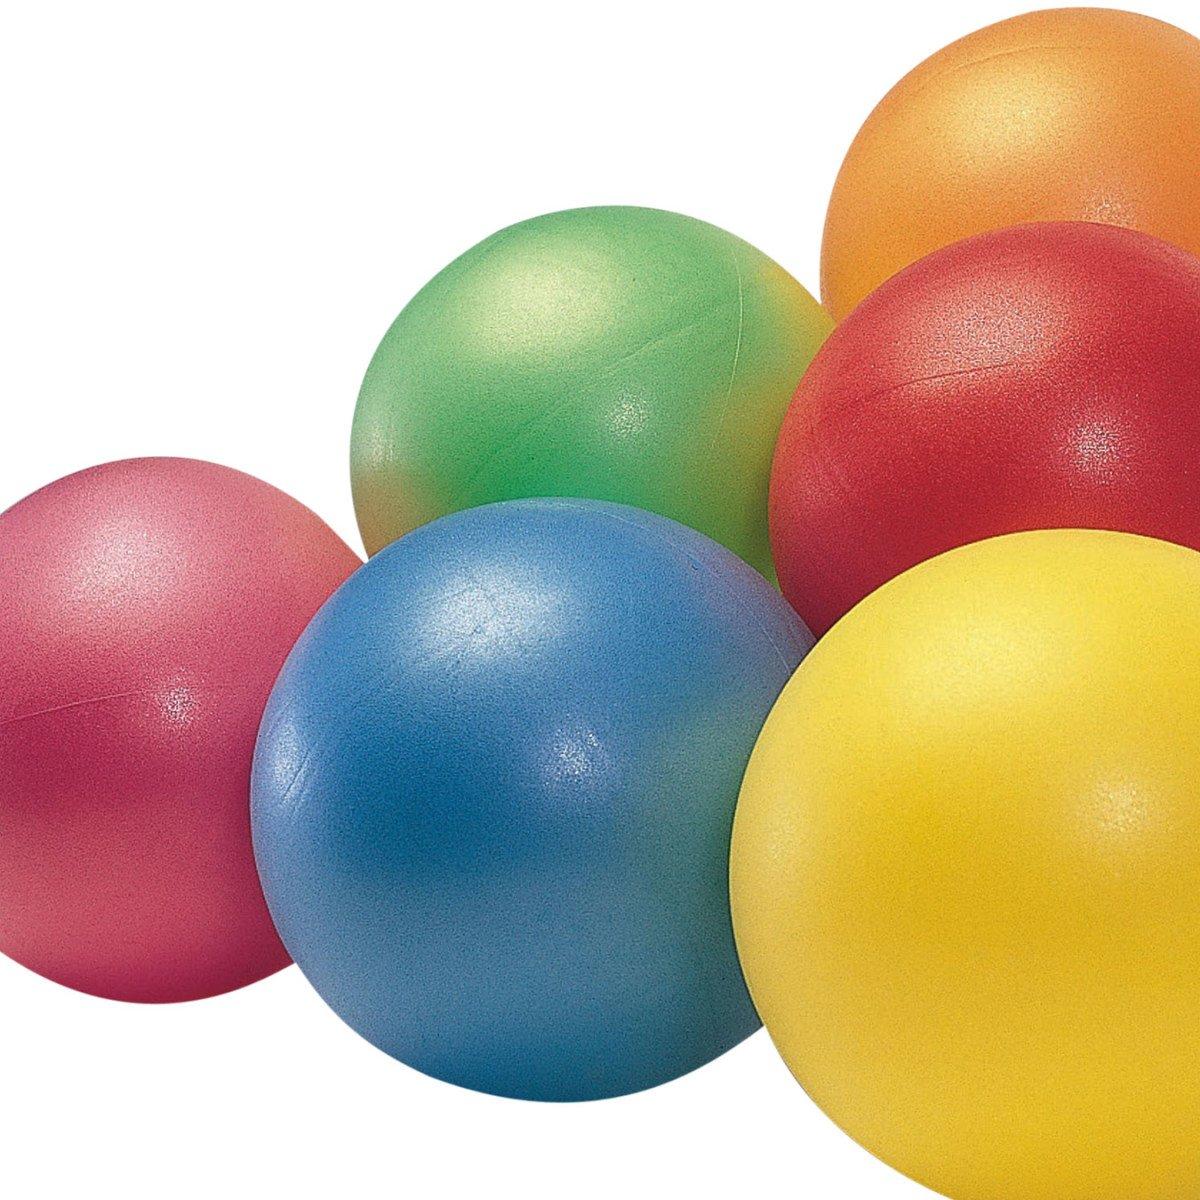 S&S Worldwide Spectrum Koogle Balls (set of 6)